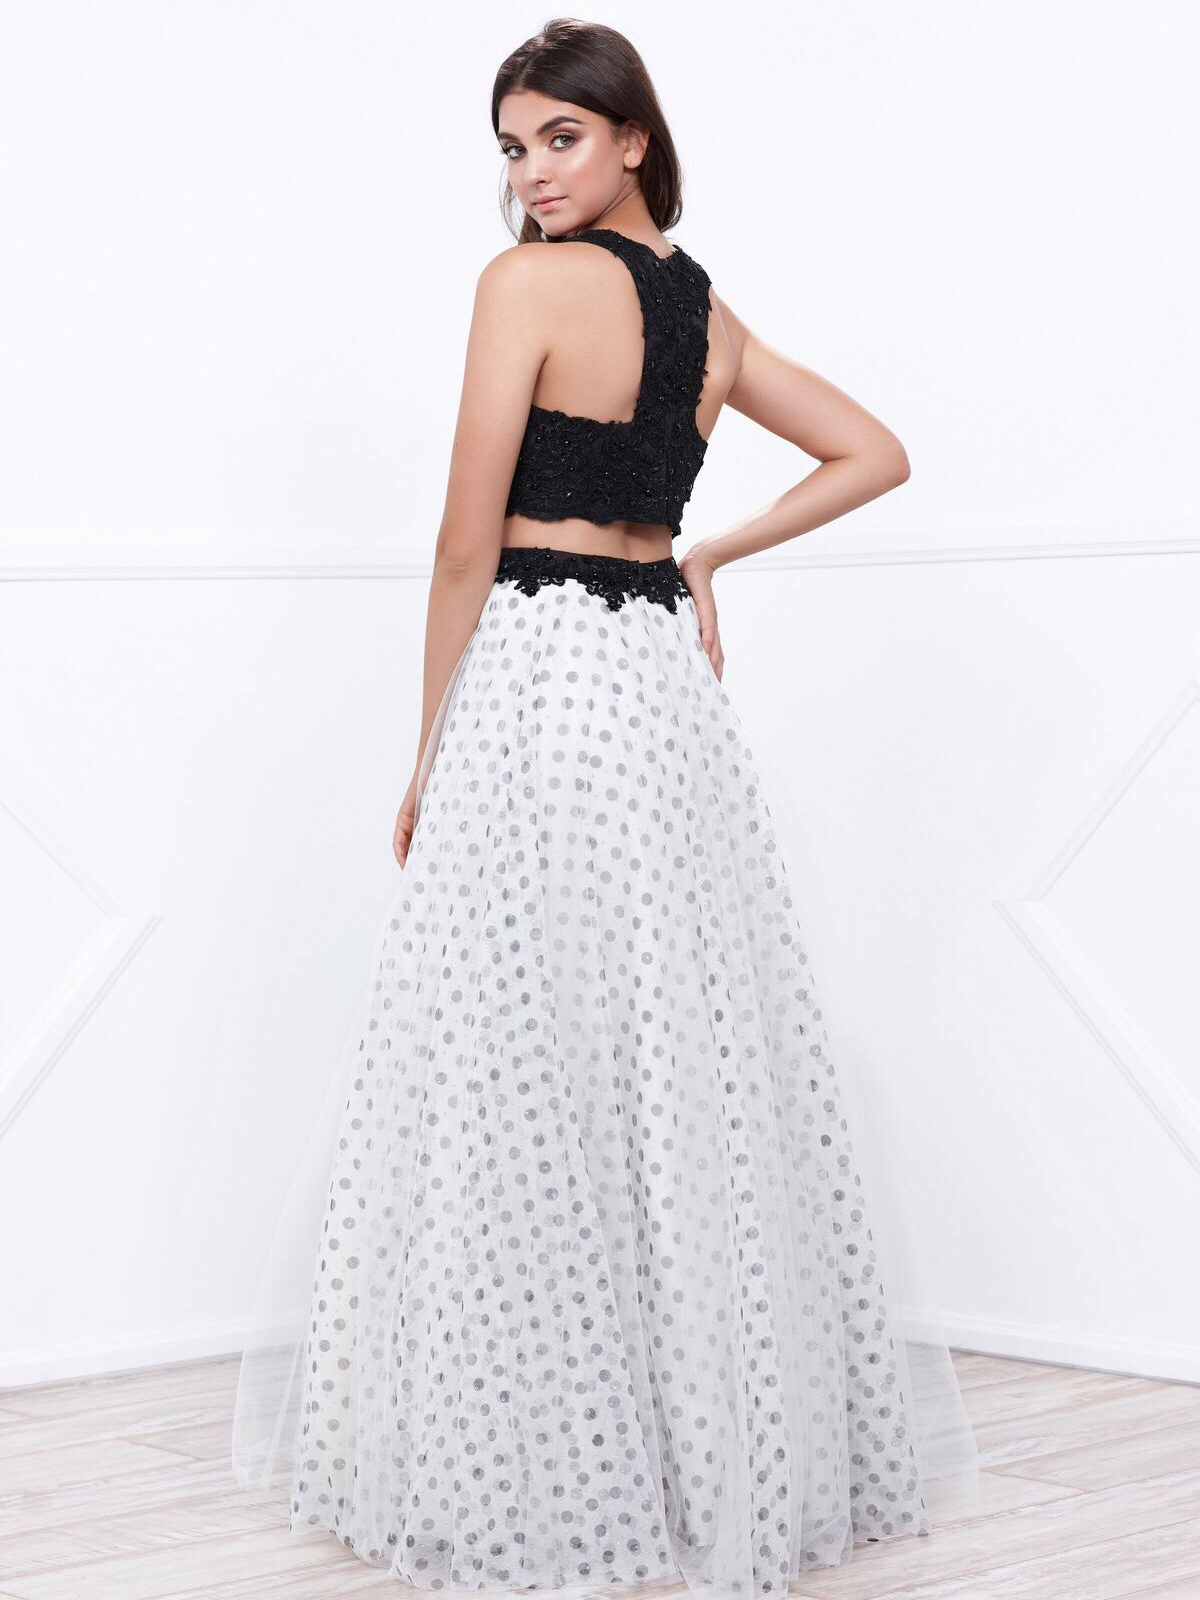 448c70ca8c4 ... 80-8309 Two-Piece Sleeveless Polka Dot Prom Dress - Black White